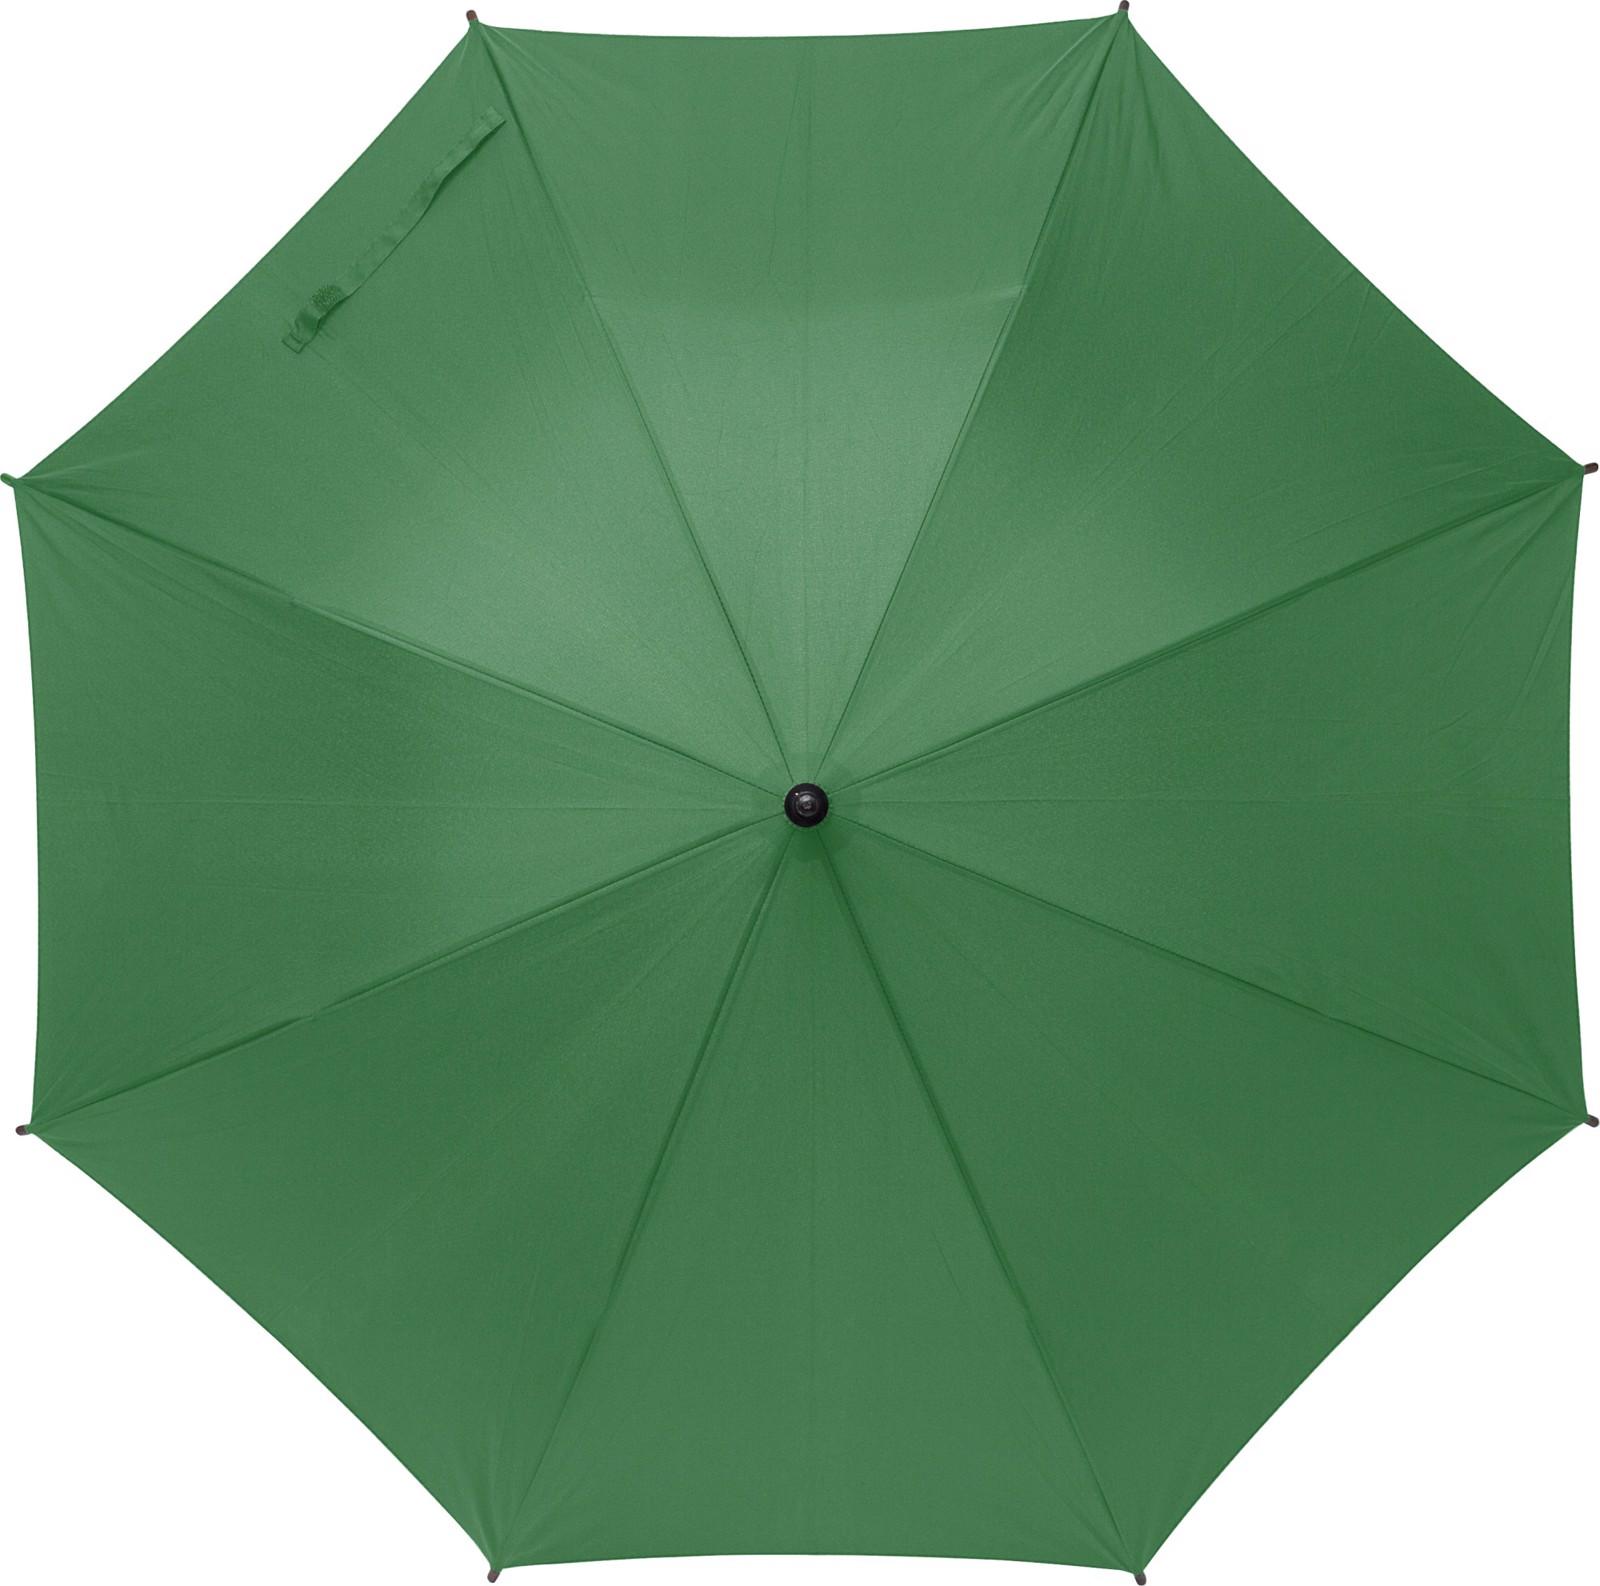 RPET polyester (170T) umbrella - Green